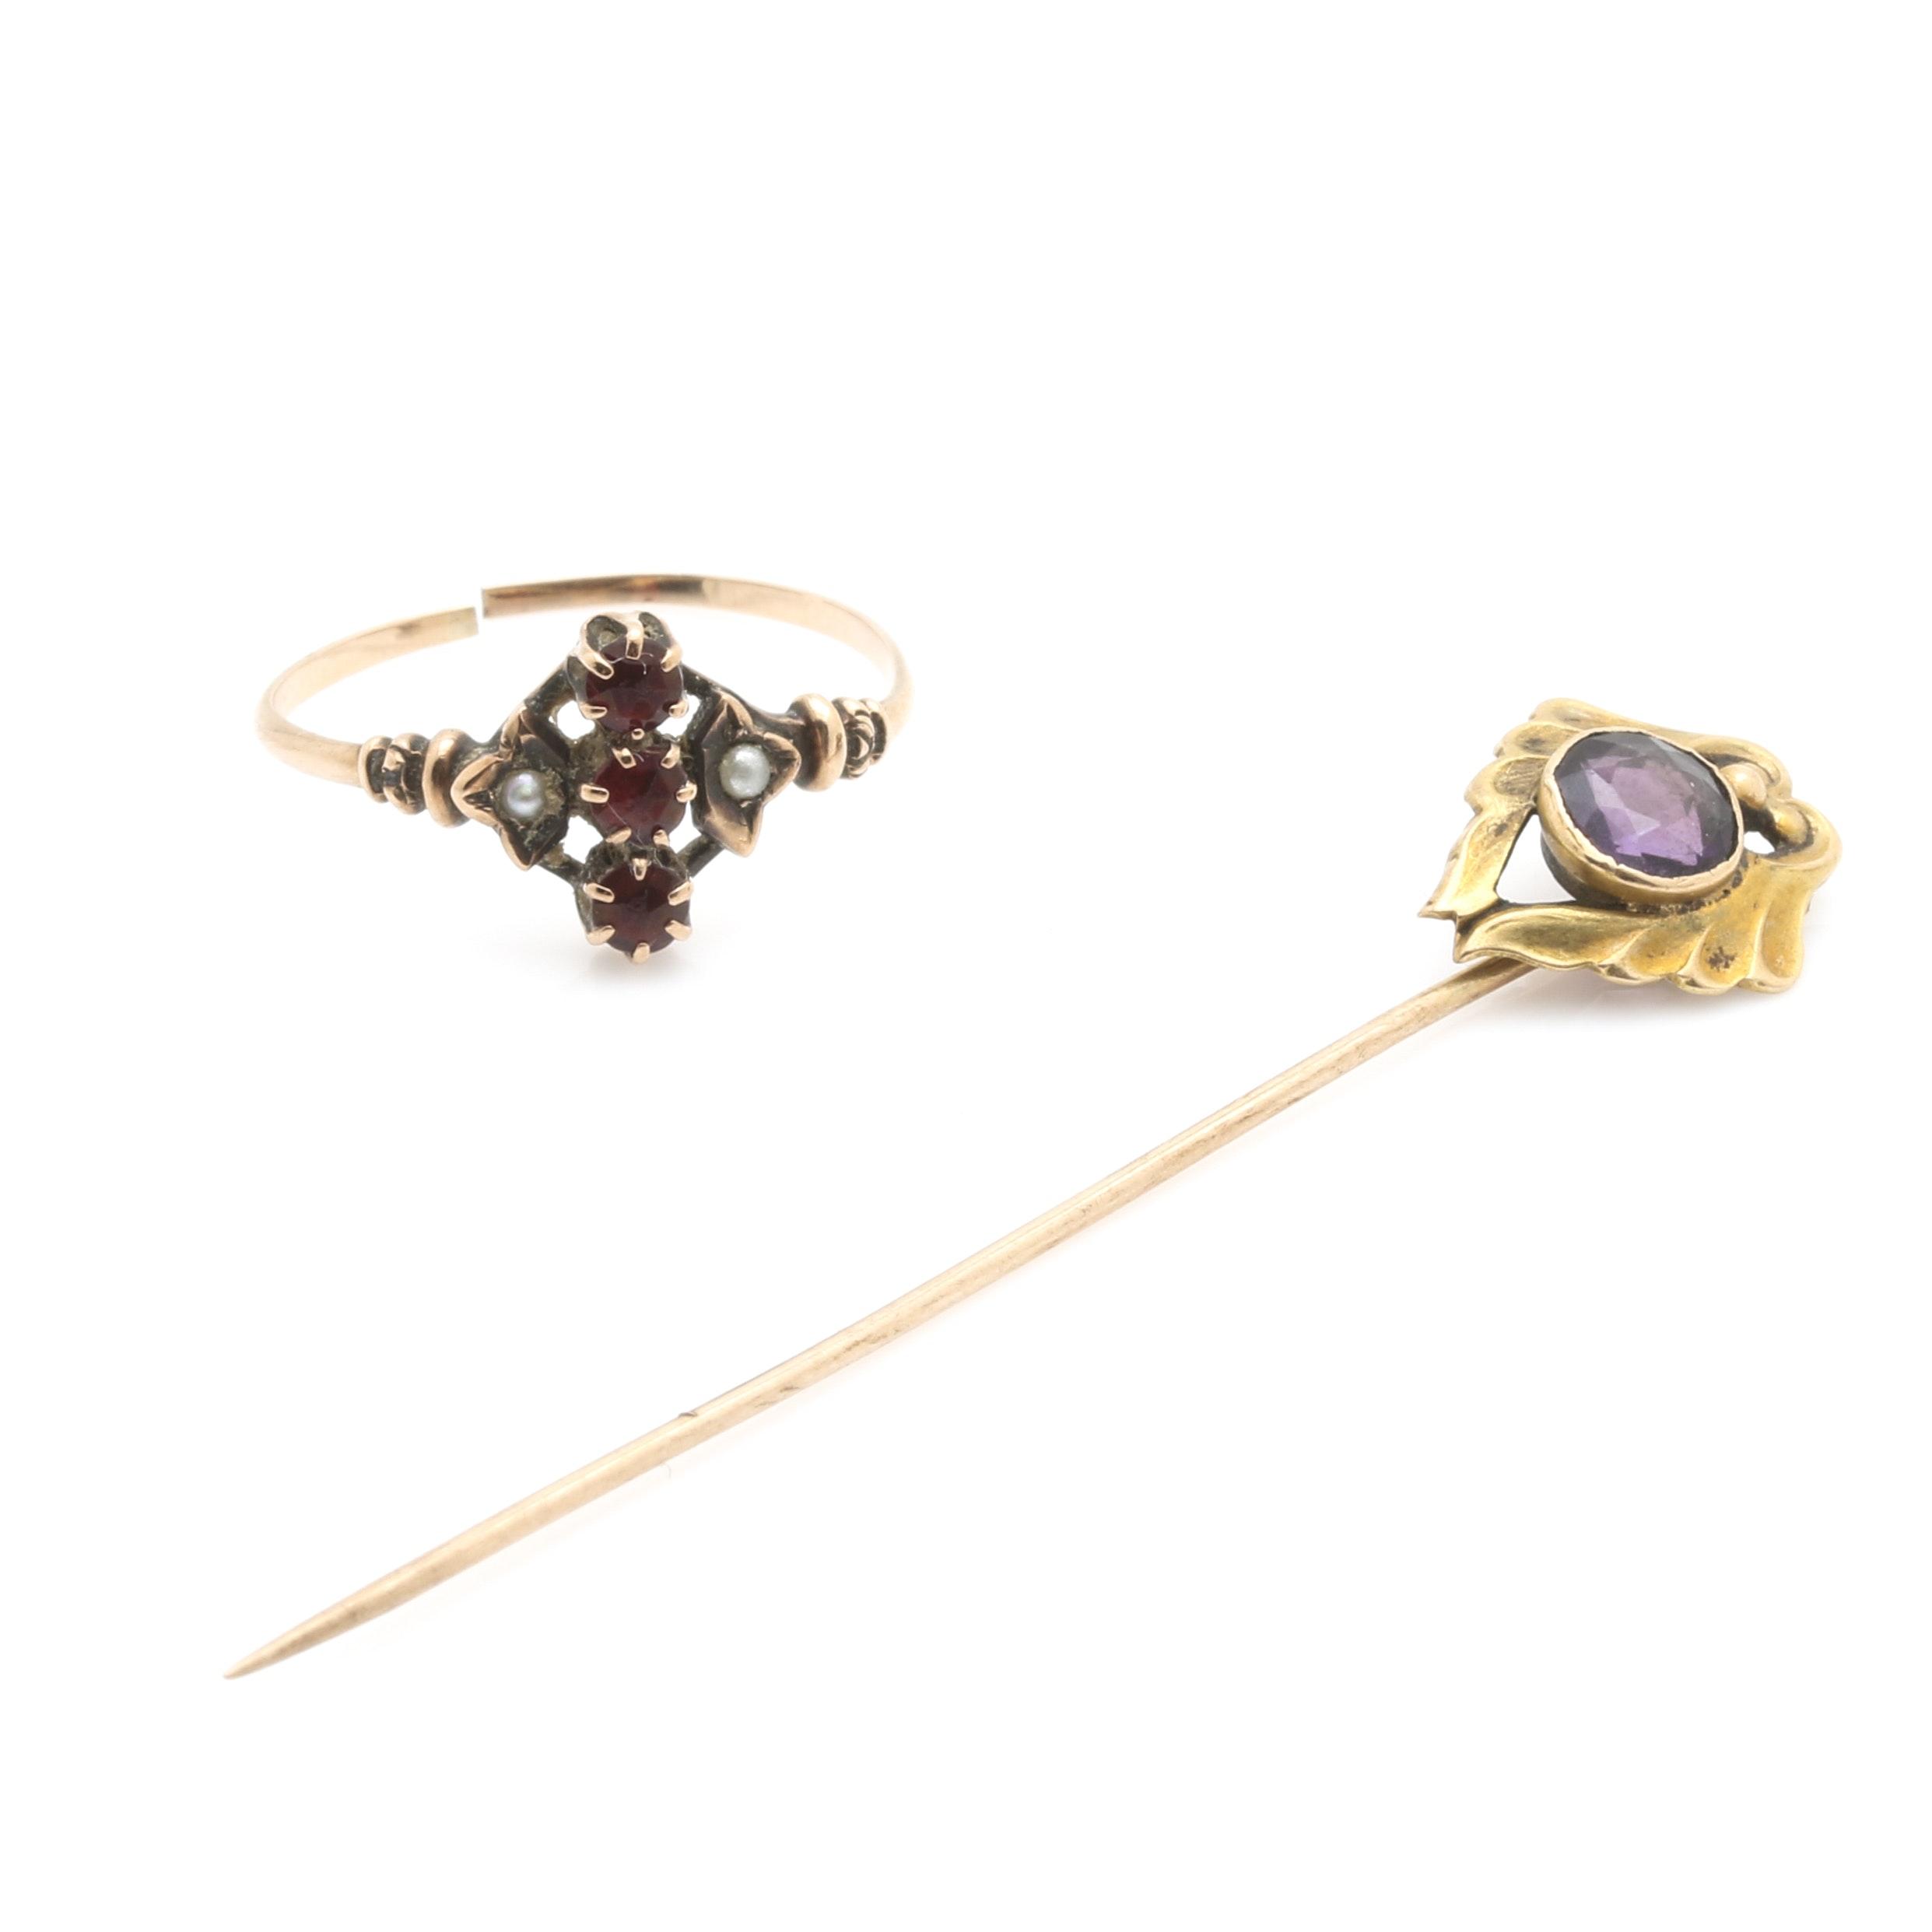 10K Yellow Gold Gemstone Jewelry Selection